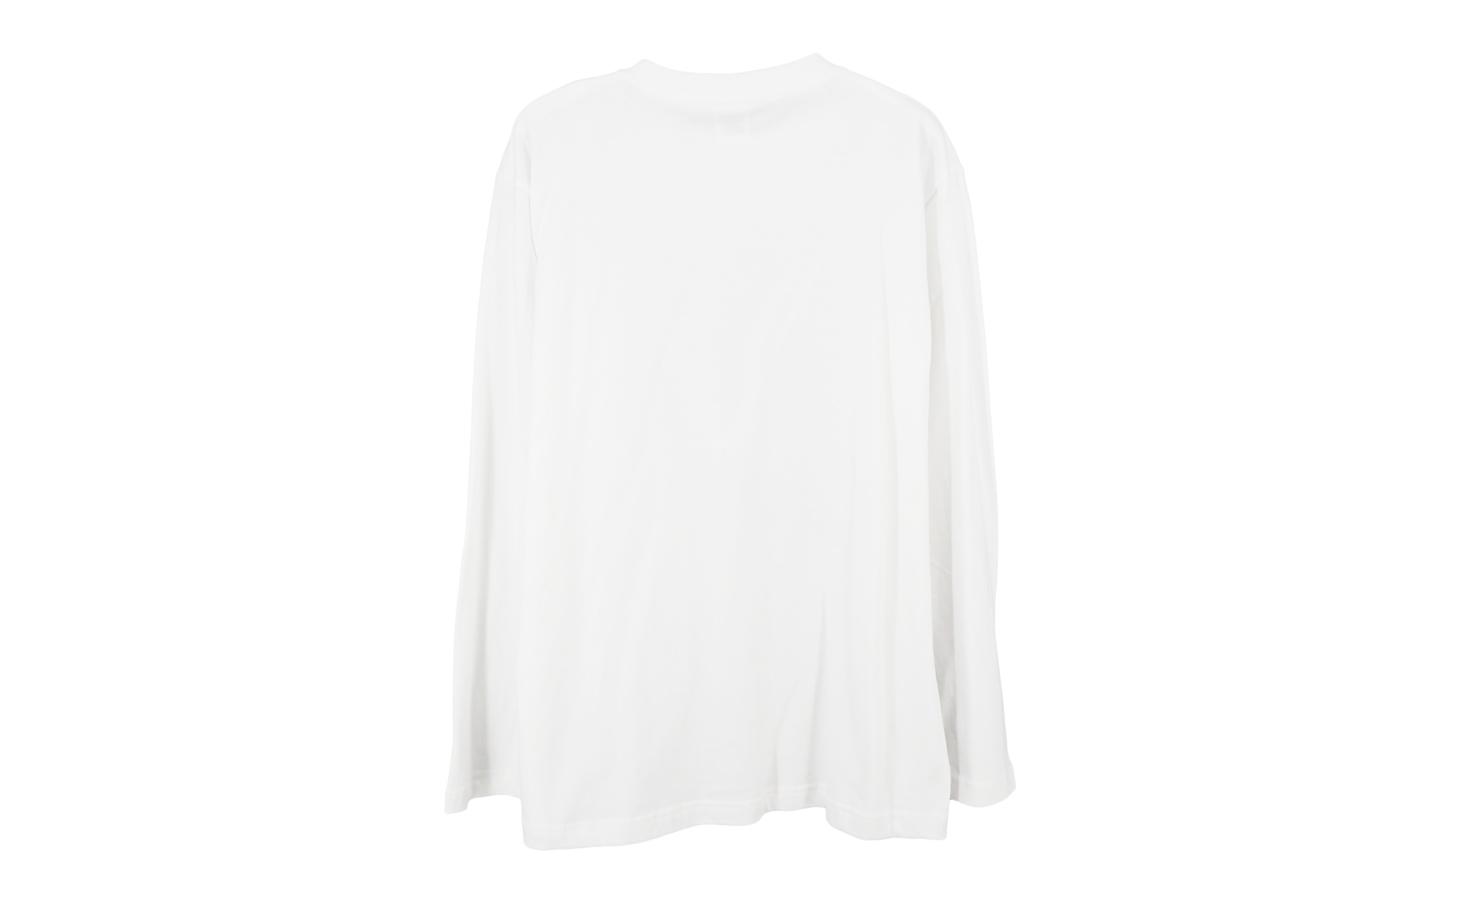 『SMOKING GIRL』 ロングスリーブTシャツ(ホワイト)